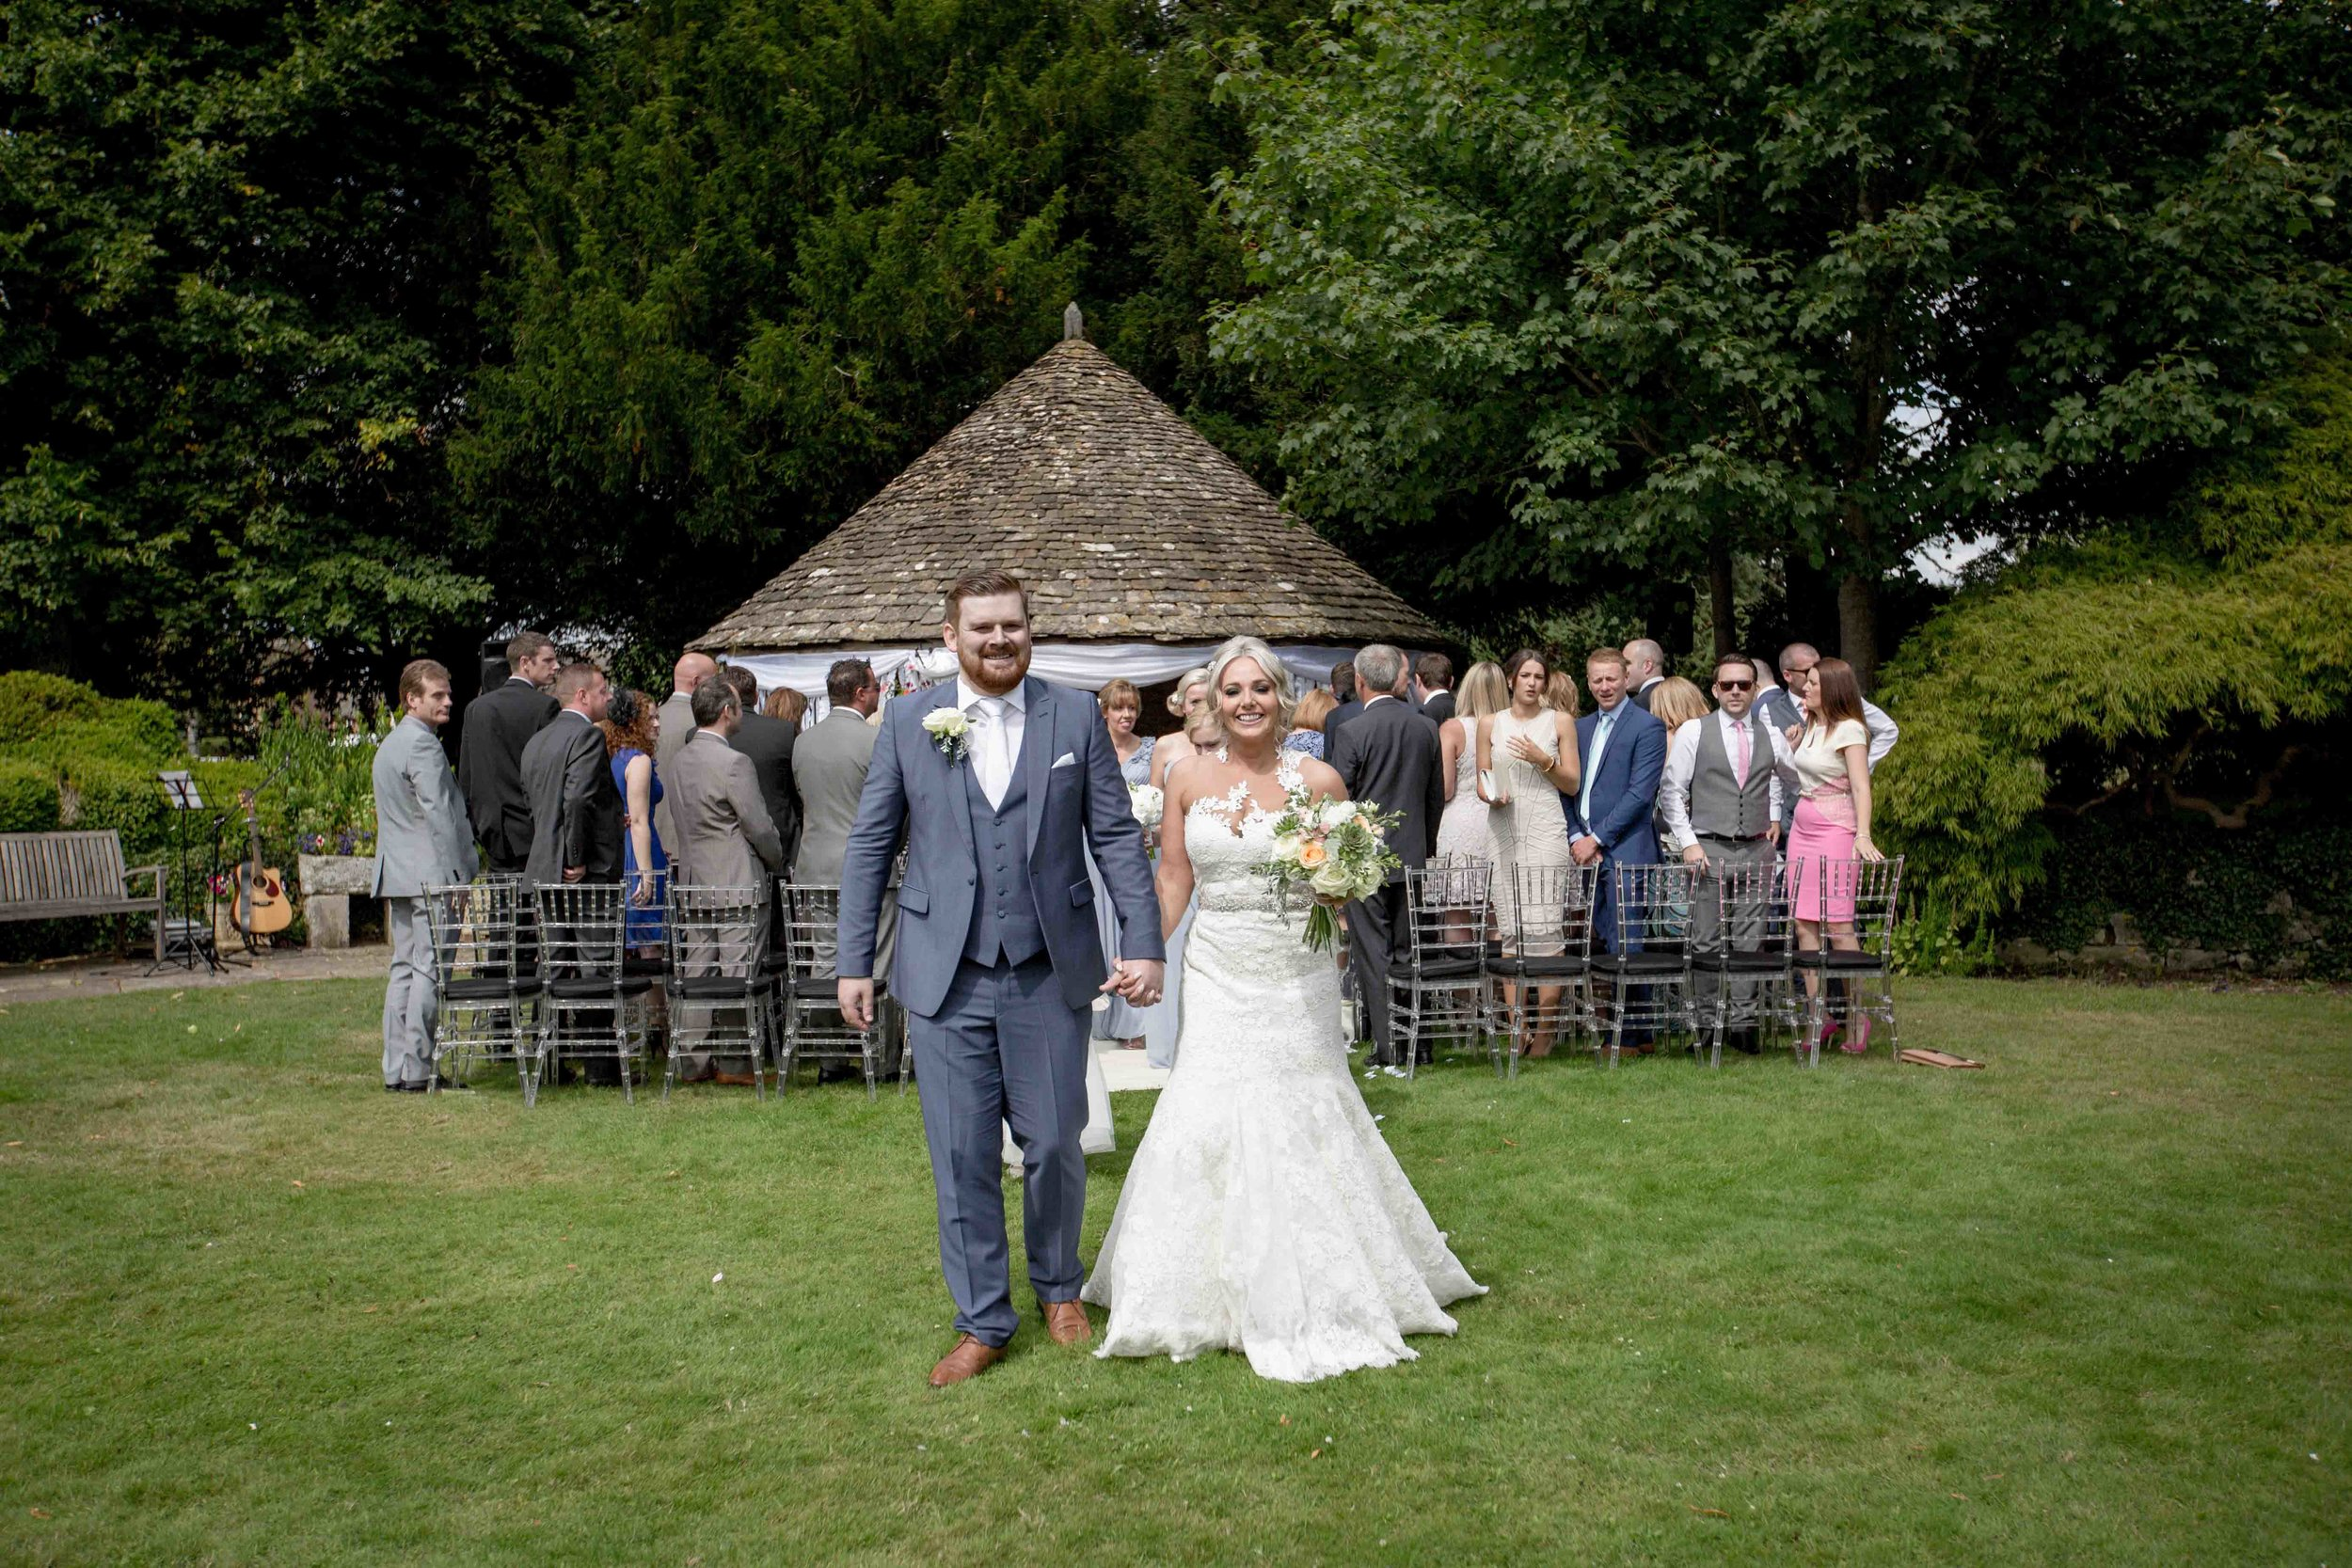 cotswold-wedding-photography-at-stonehouse-court-hotel-natalia-smith-photography-gloucestershire-wedding-photographer-47.jpg